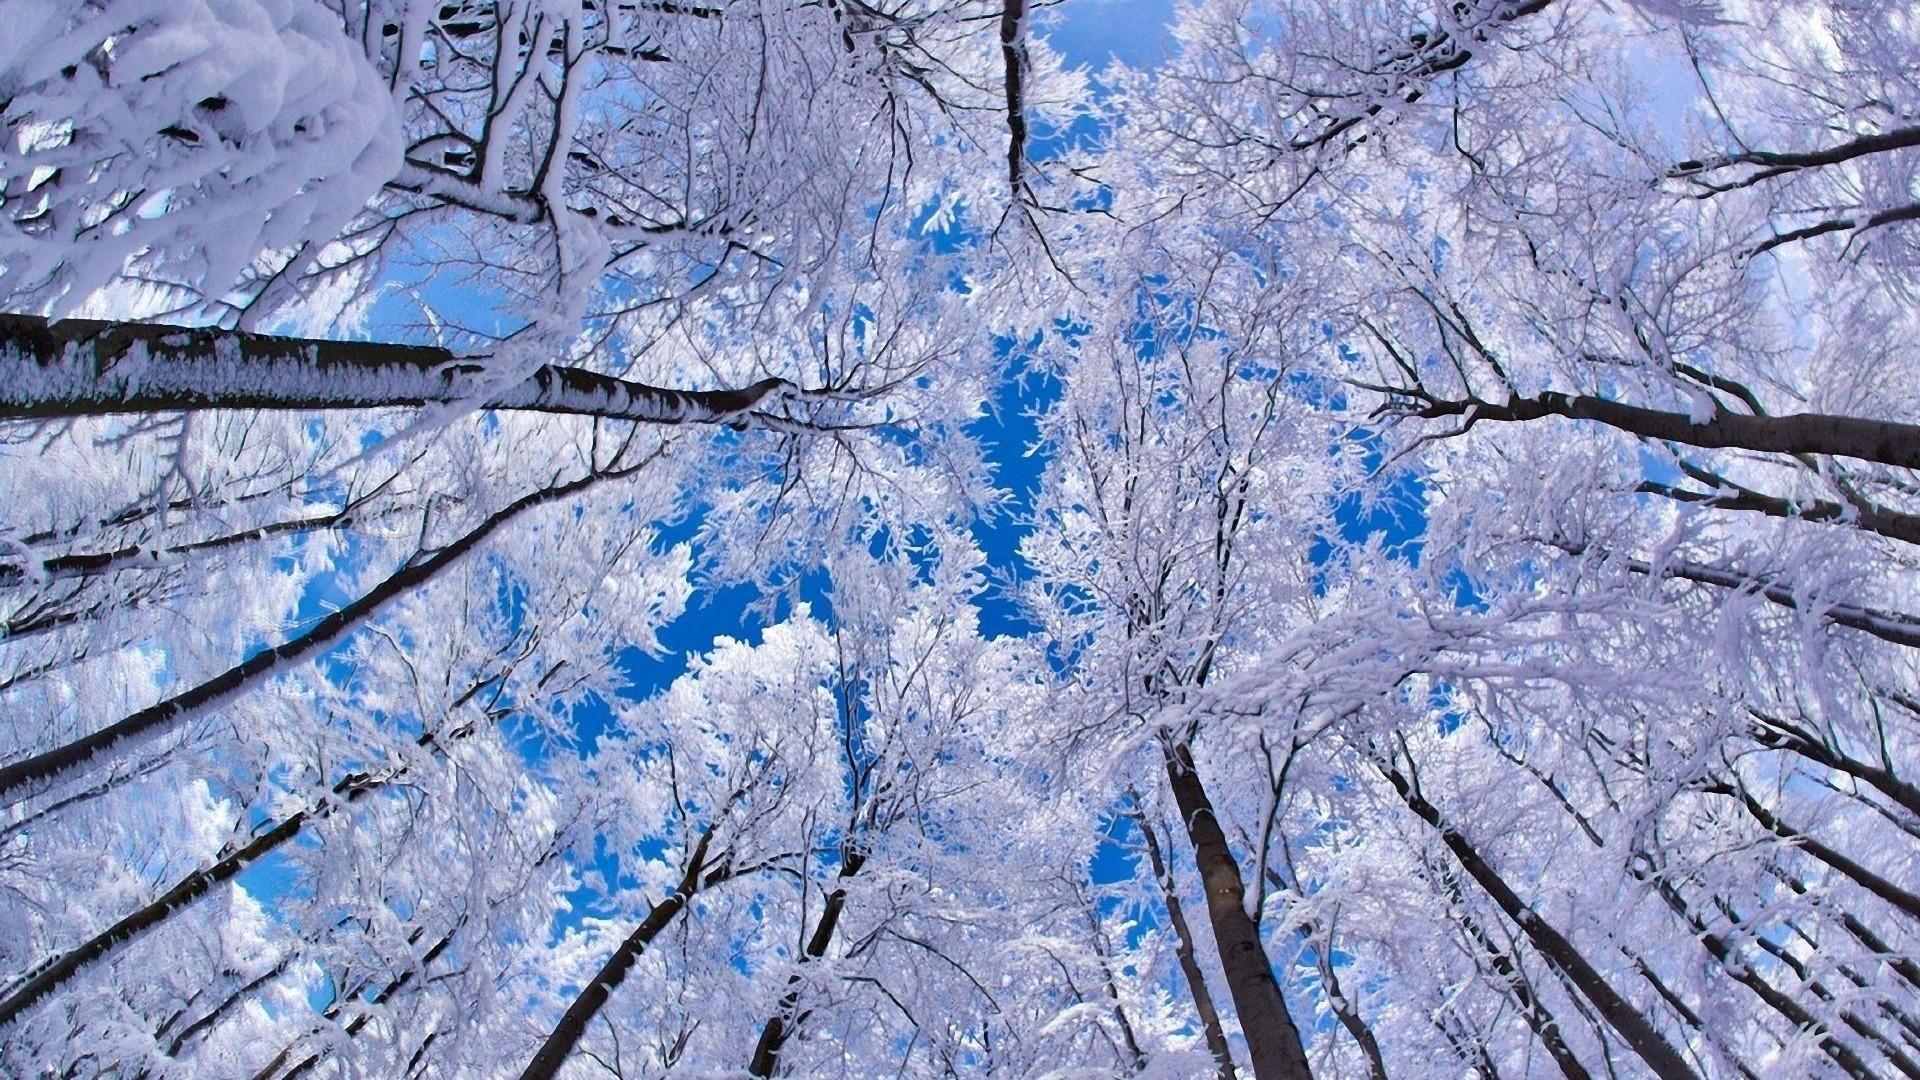 Snow In Baku And Districts - Winter Wallpaper Mac - HD Wallpaper